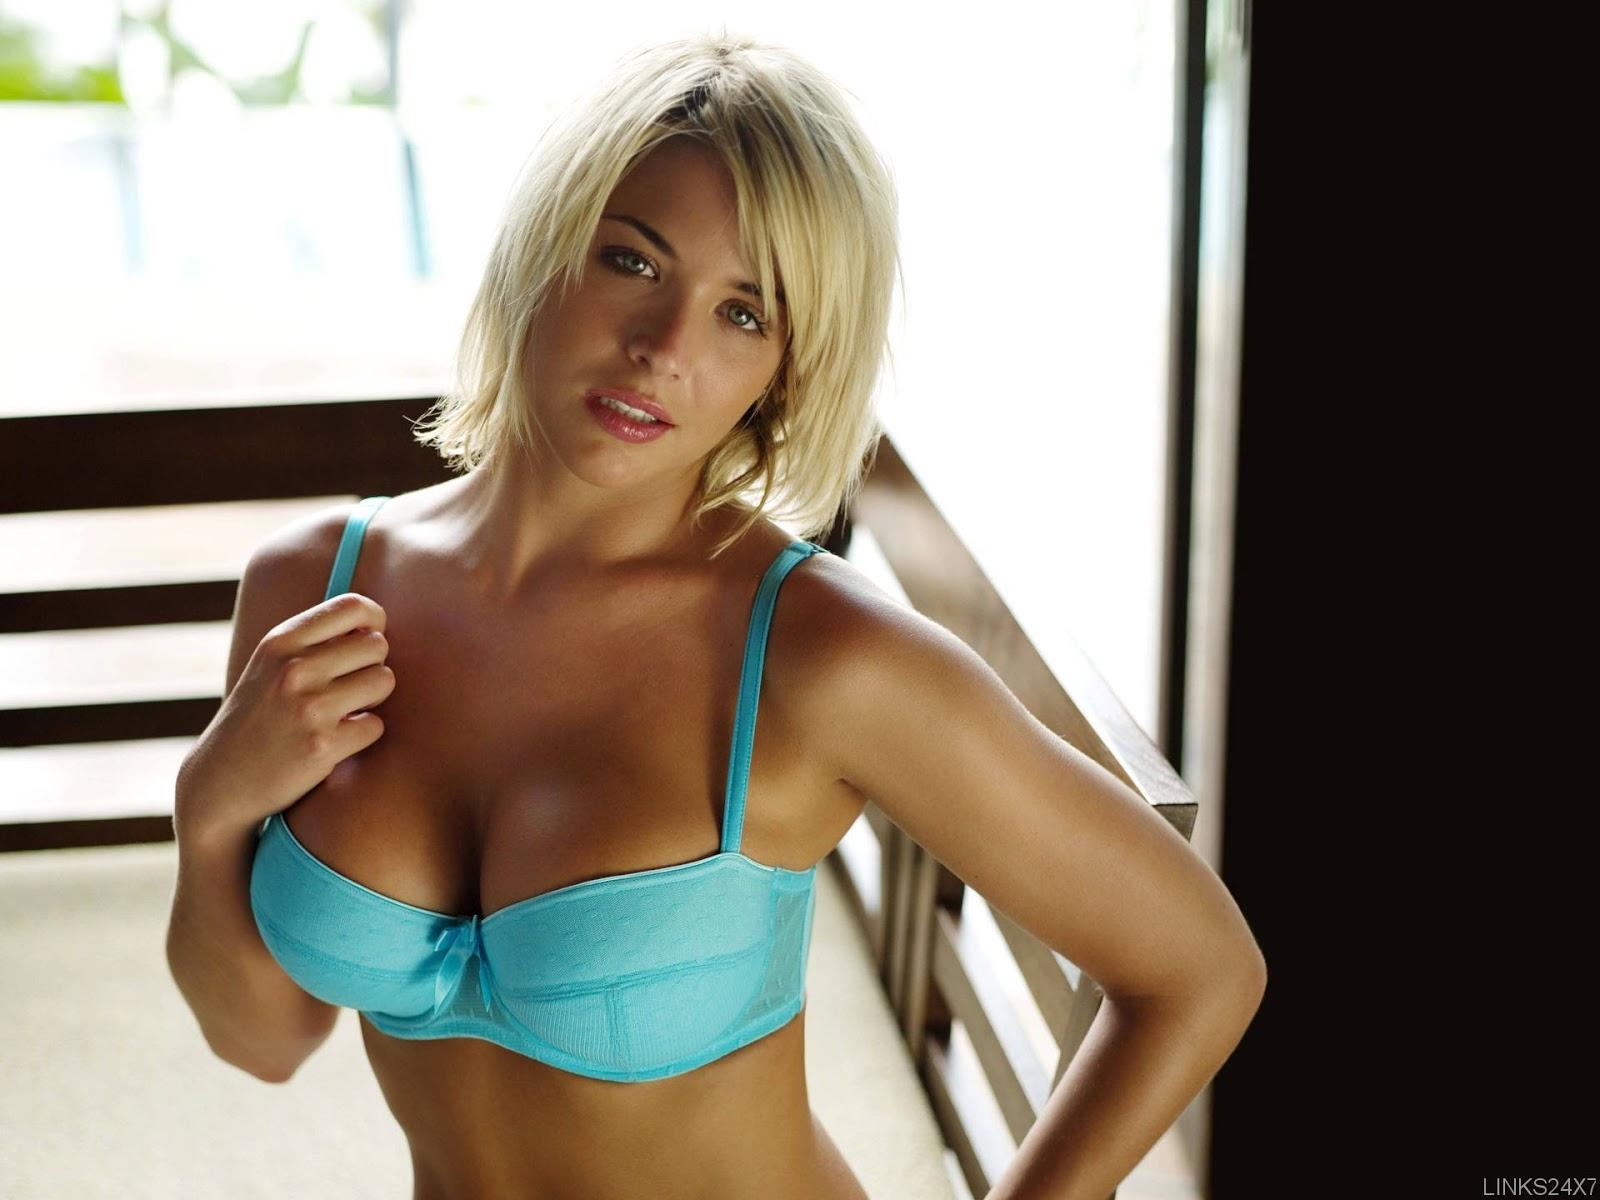 Gemma Atkinson nude pics